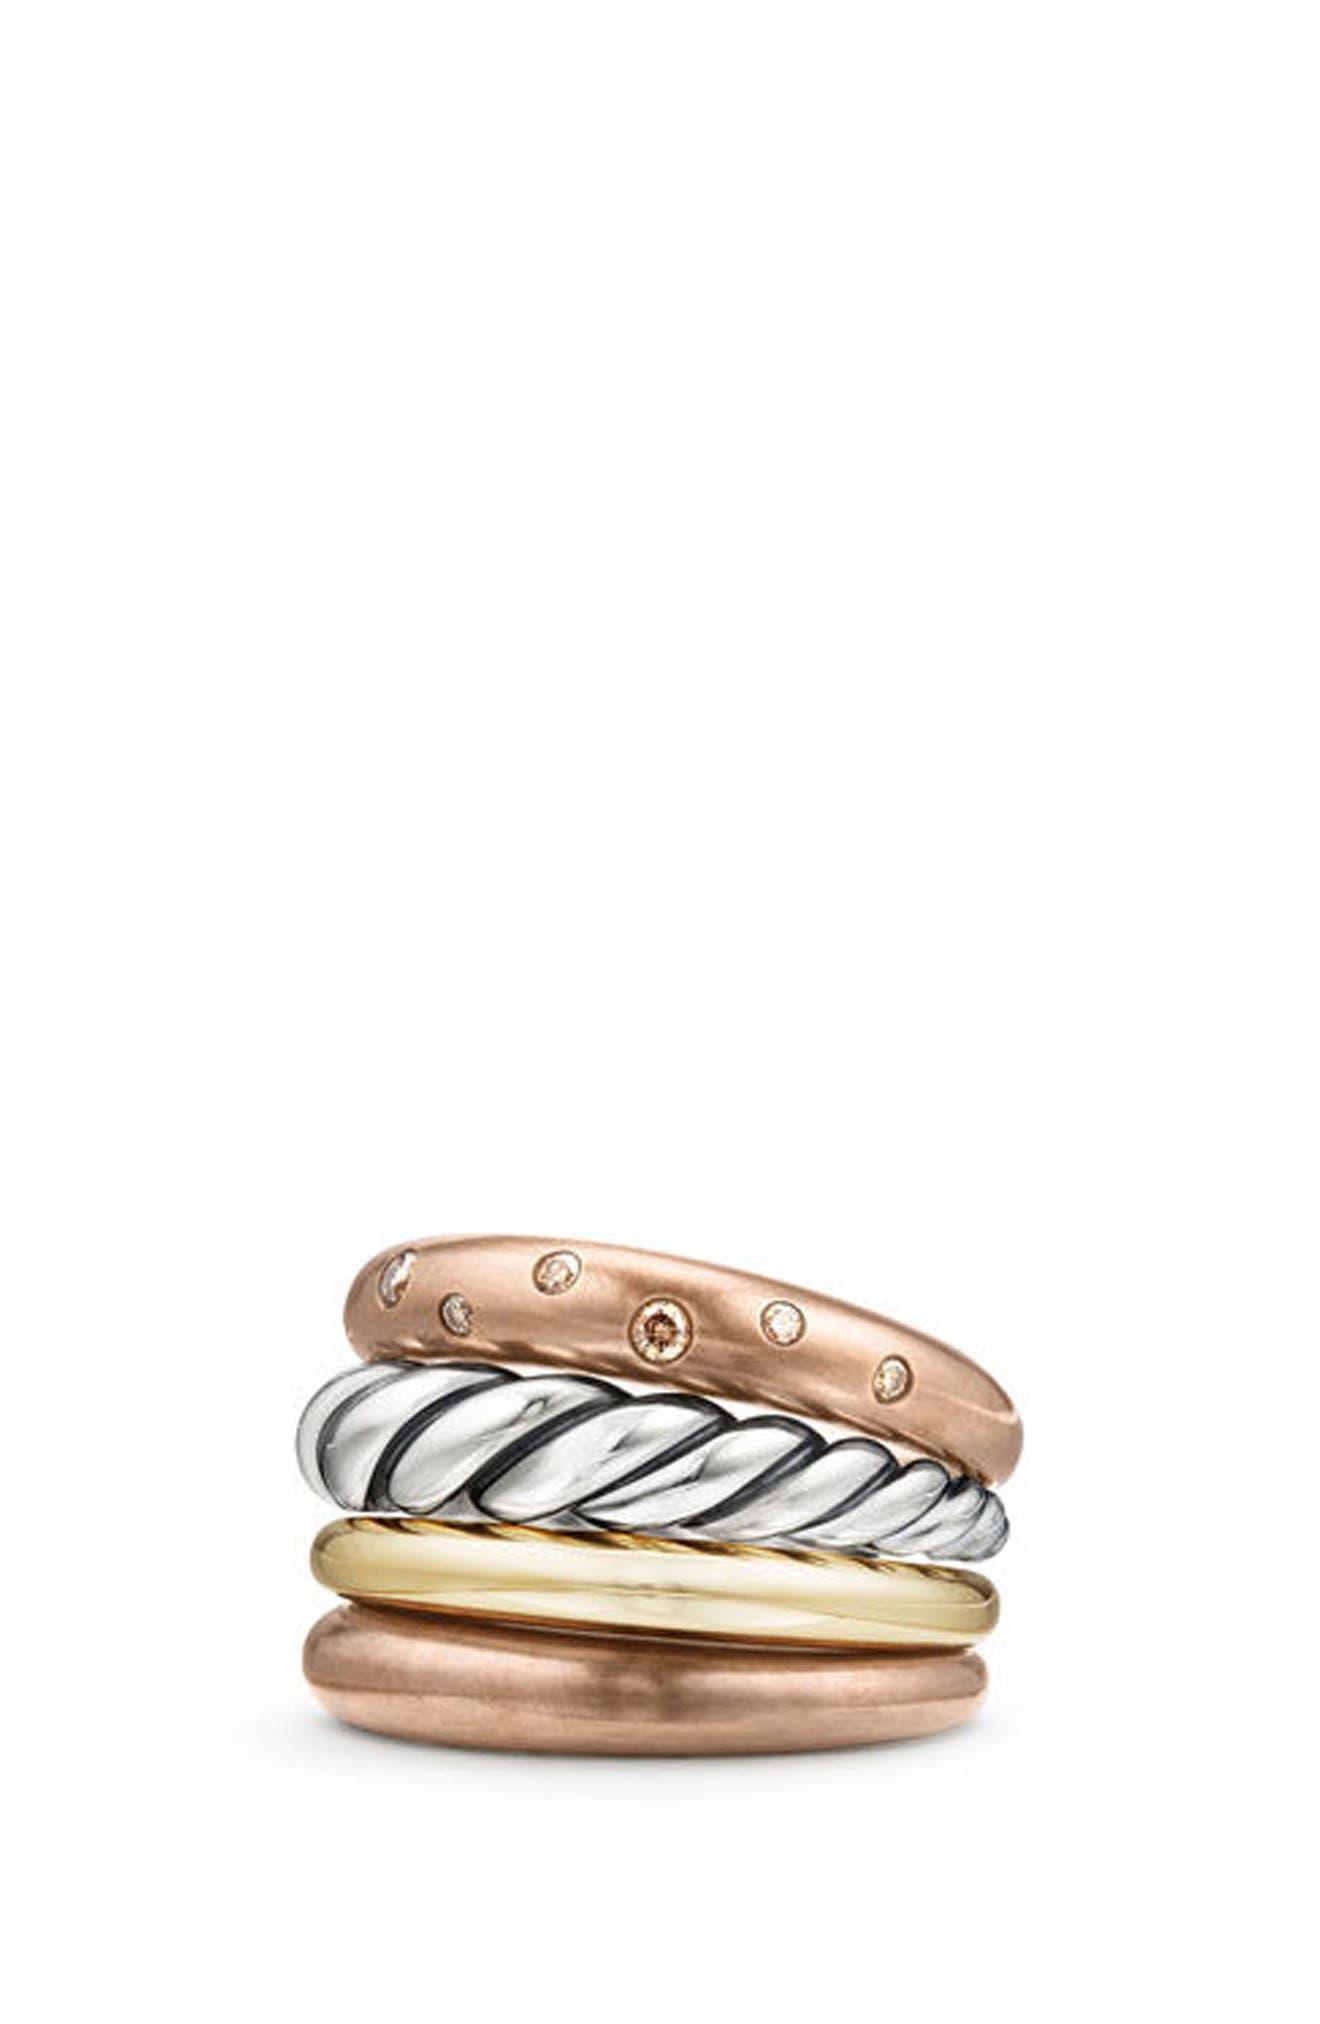 Main Image - David Yurman Pure Form Mixed Metal Four-Row Ring with Diamonds, Bronze & Silver, 17.5mm